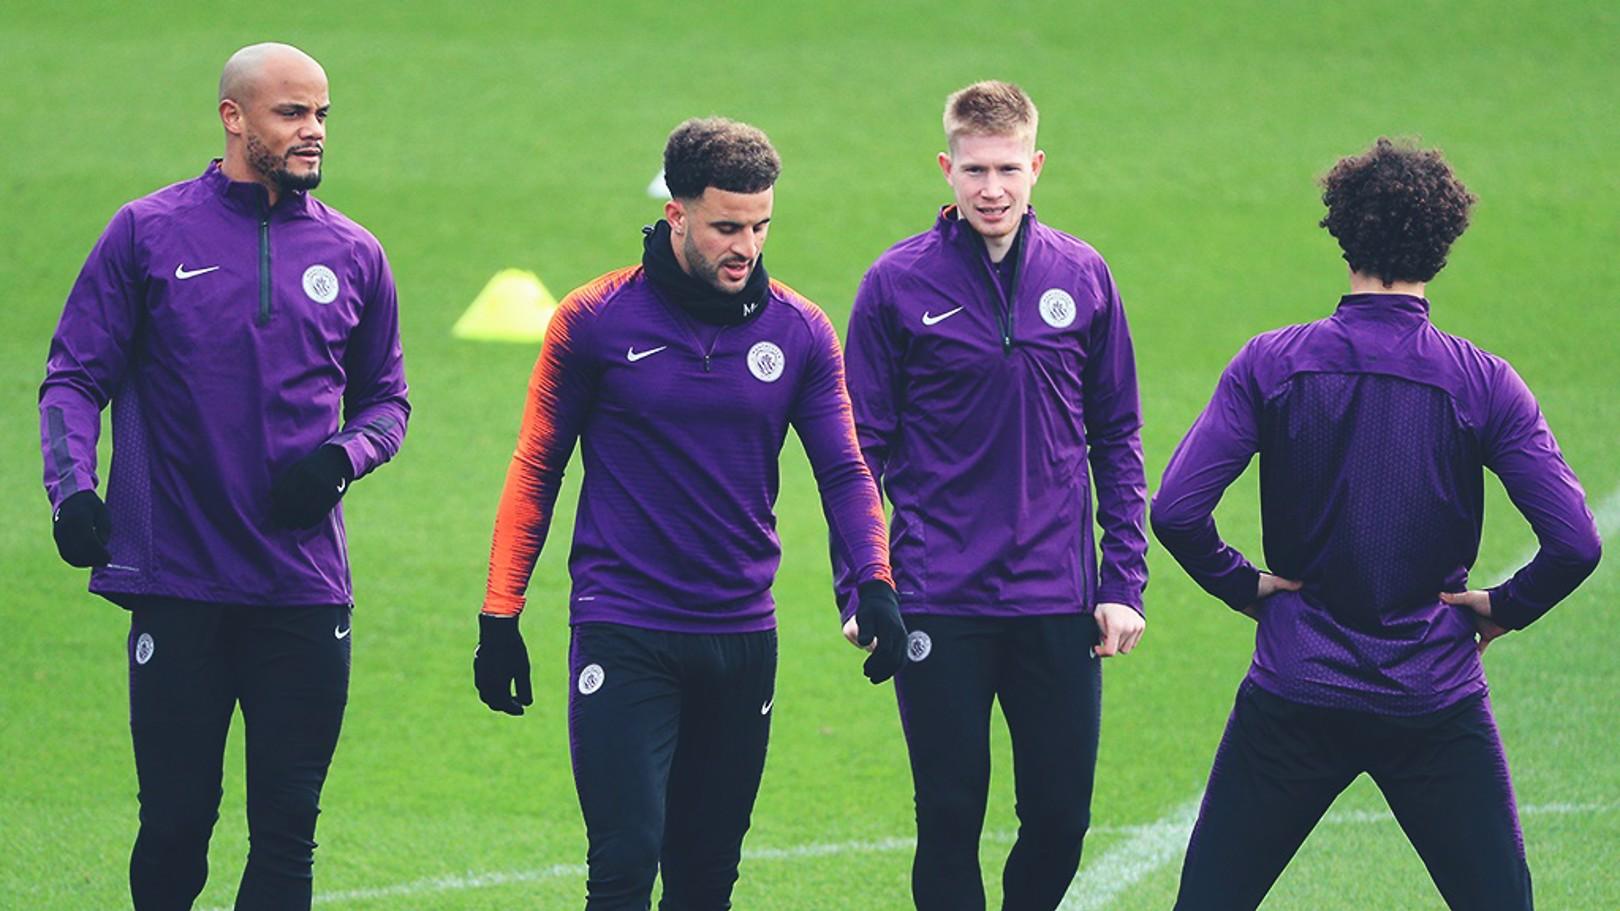 Schalke v City: Kompany travels, quartet ruled out